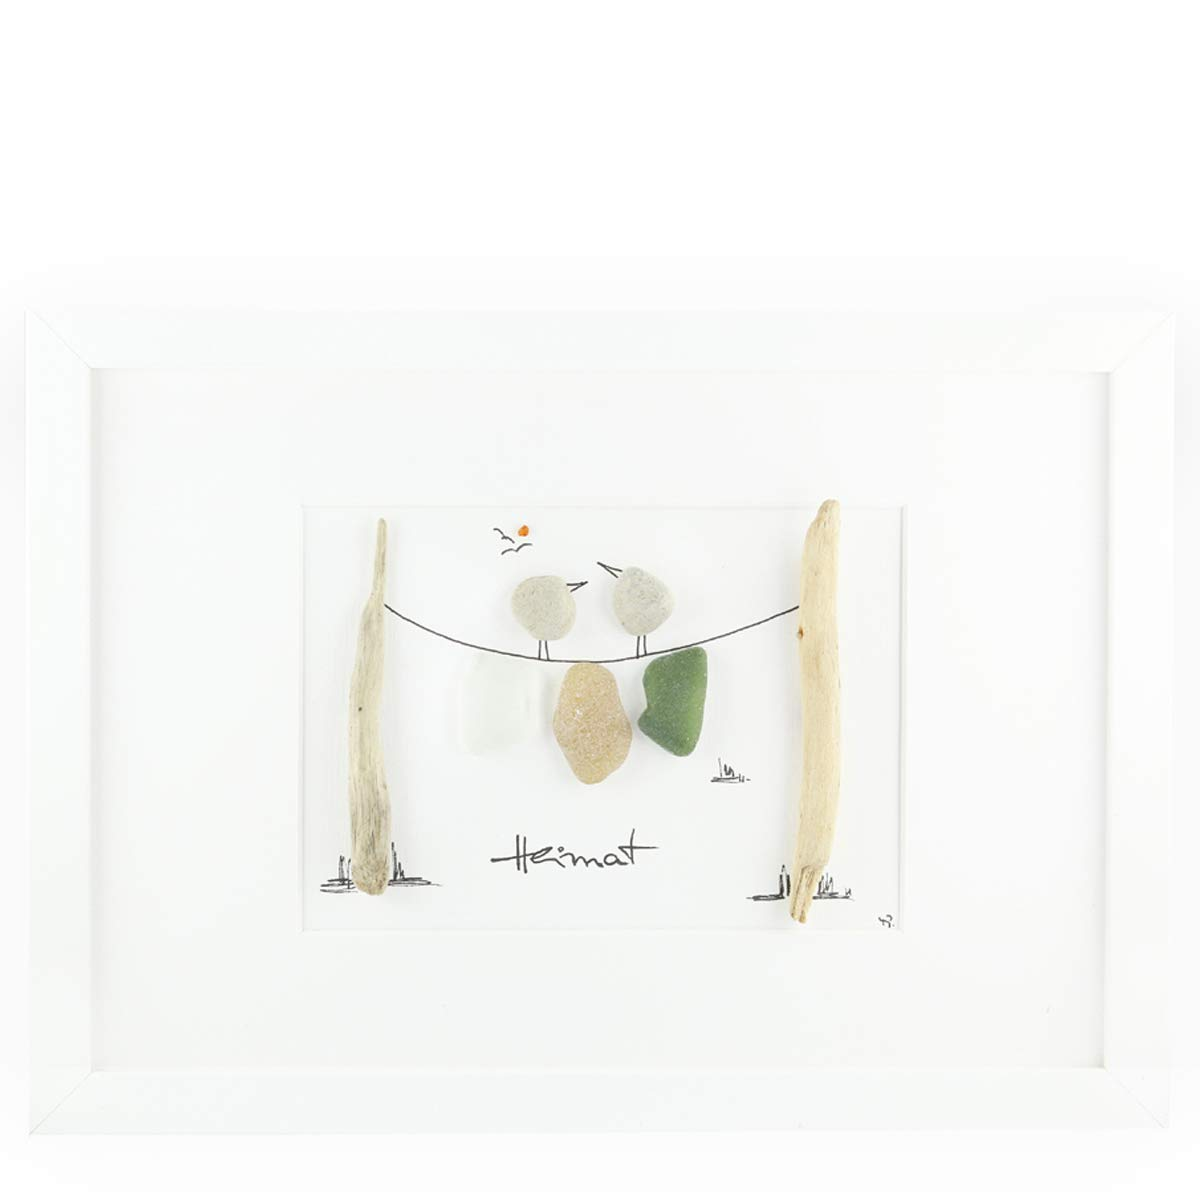 Kieselkunst Kiesel-Steinbilder Heimat Querformat gro/ß 23,5x32,5cm